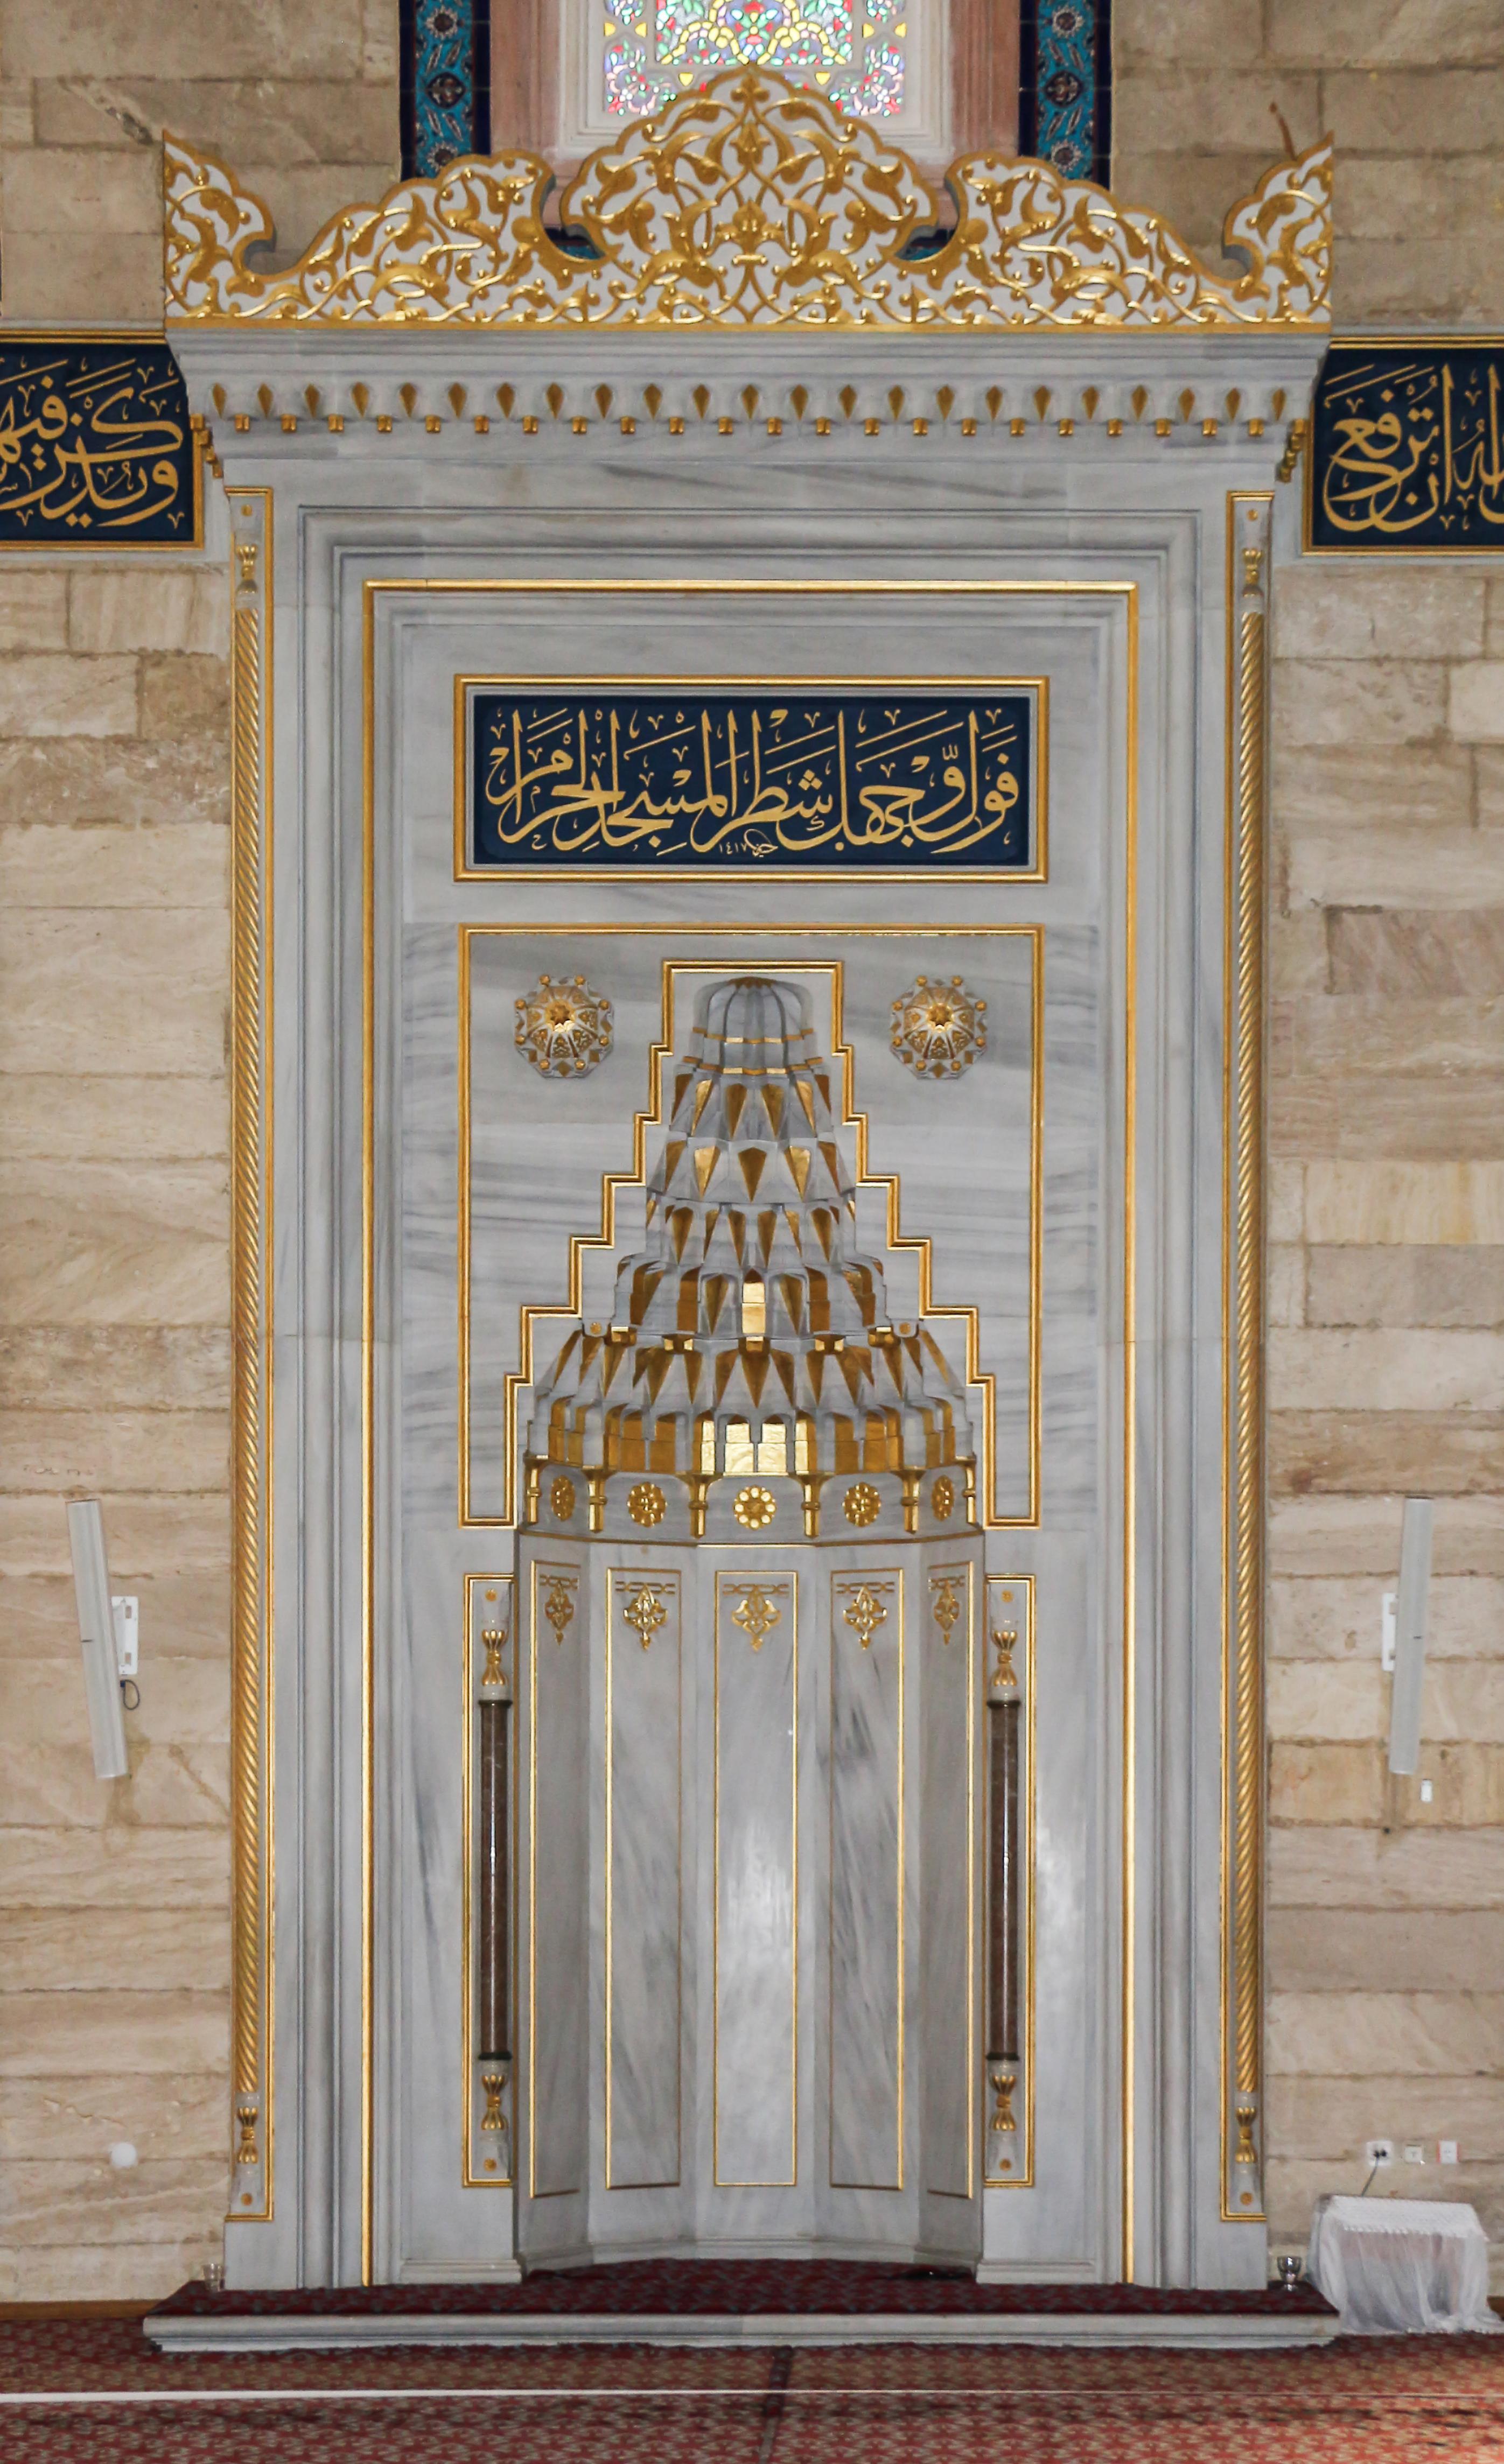 File:Sabancı Merkez Camii - Mihrab.jpg - Wikimedia Commons